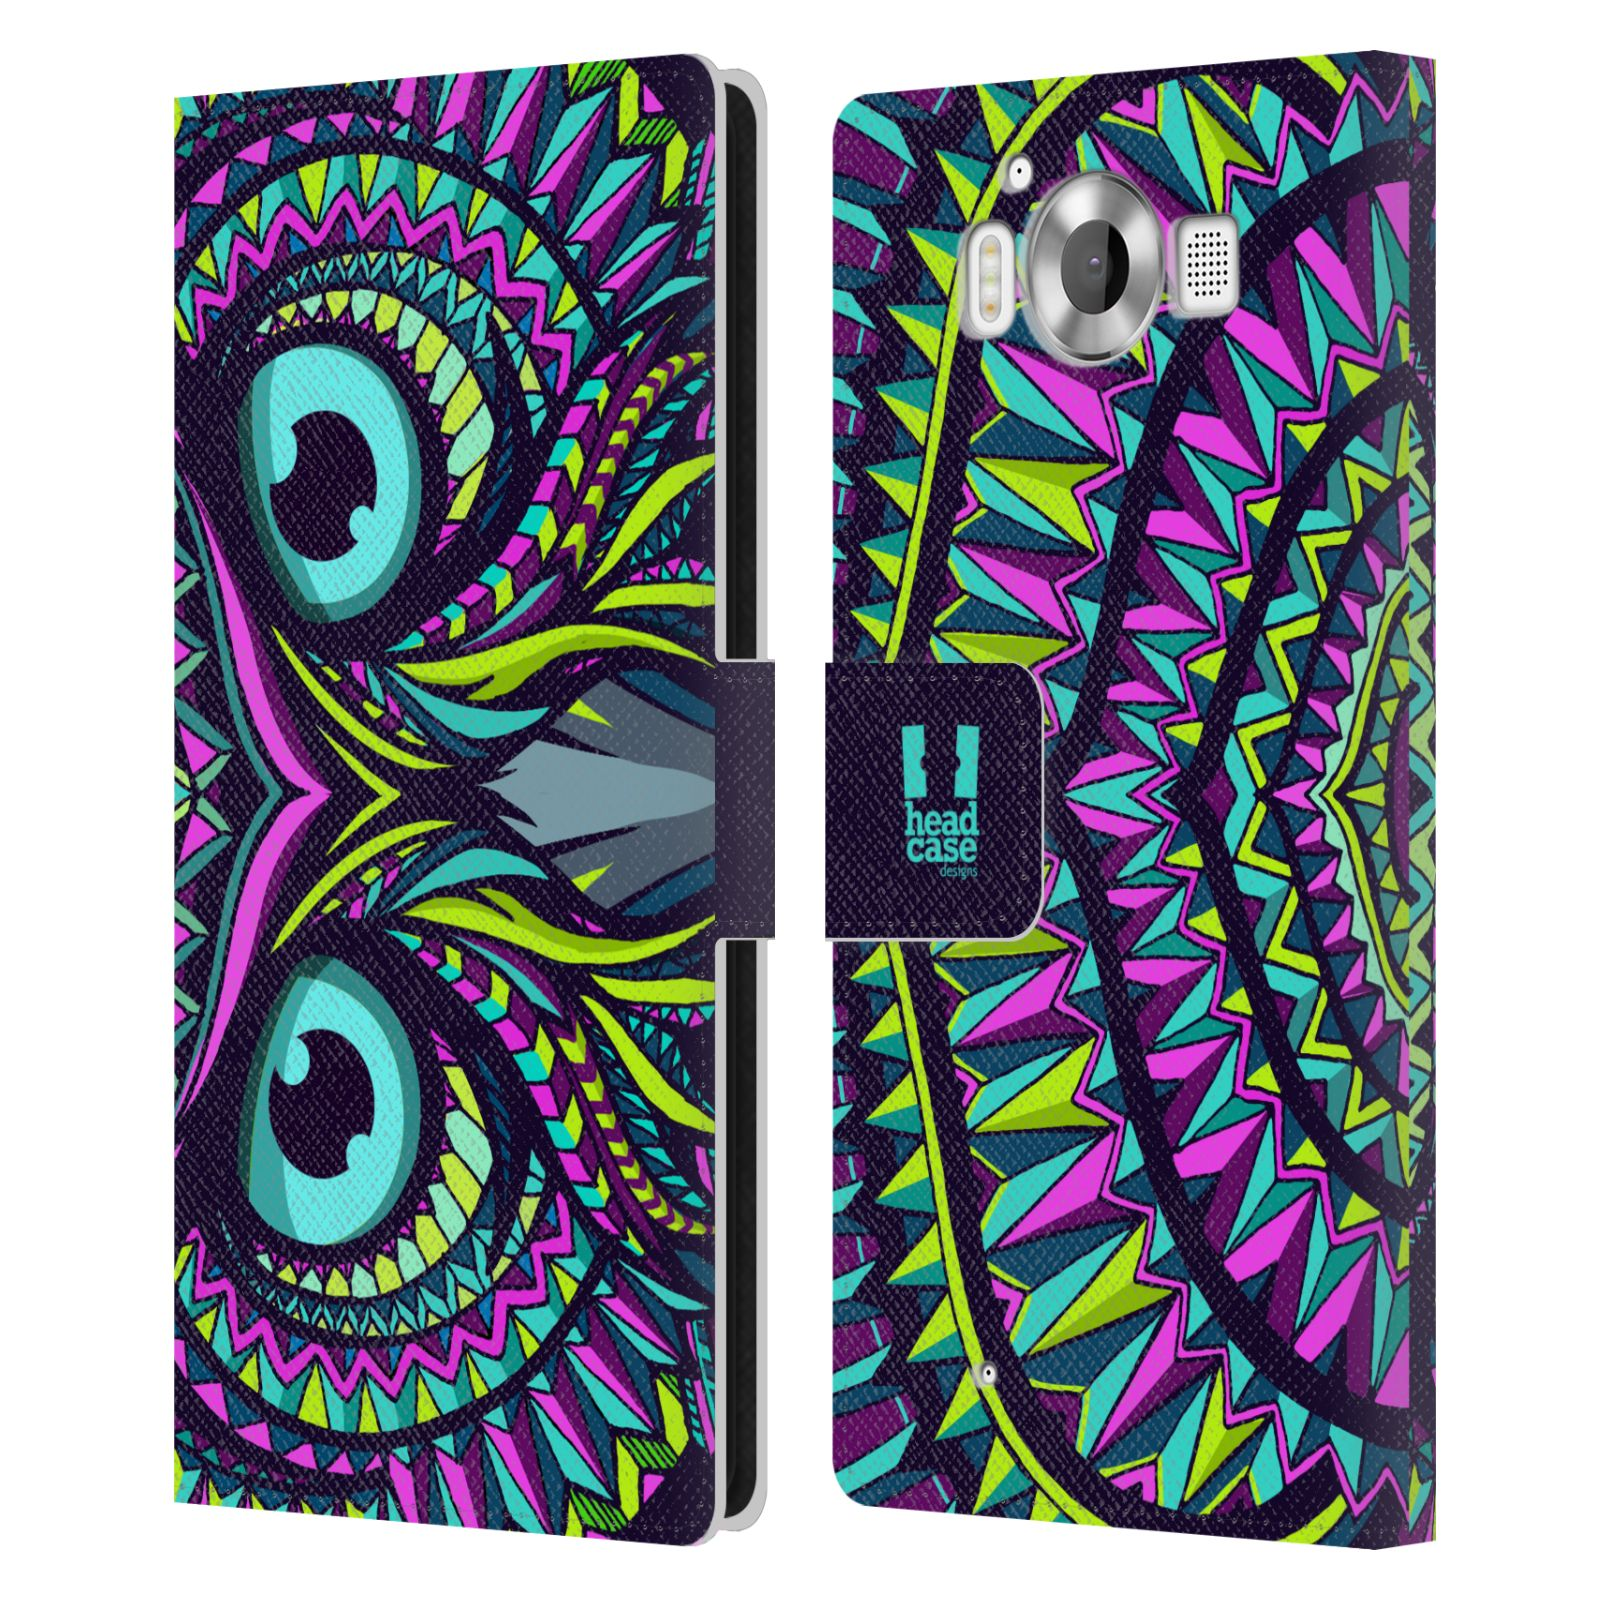 Pouzdro na mobil Nokia Lumia 950 - Head Case - Aztécký vzor sova